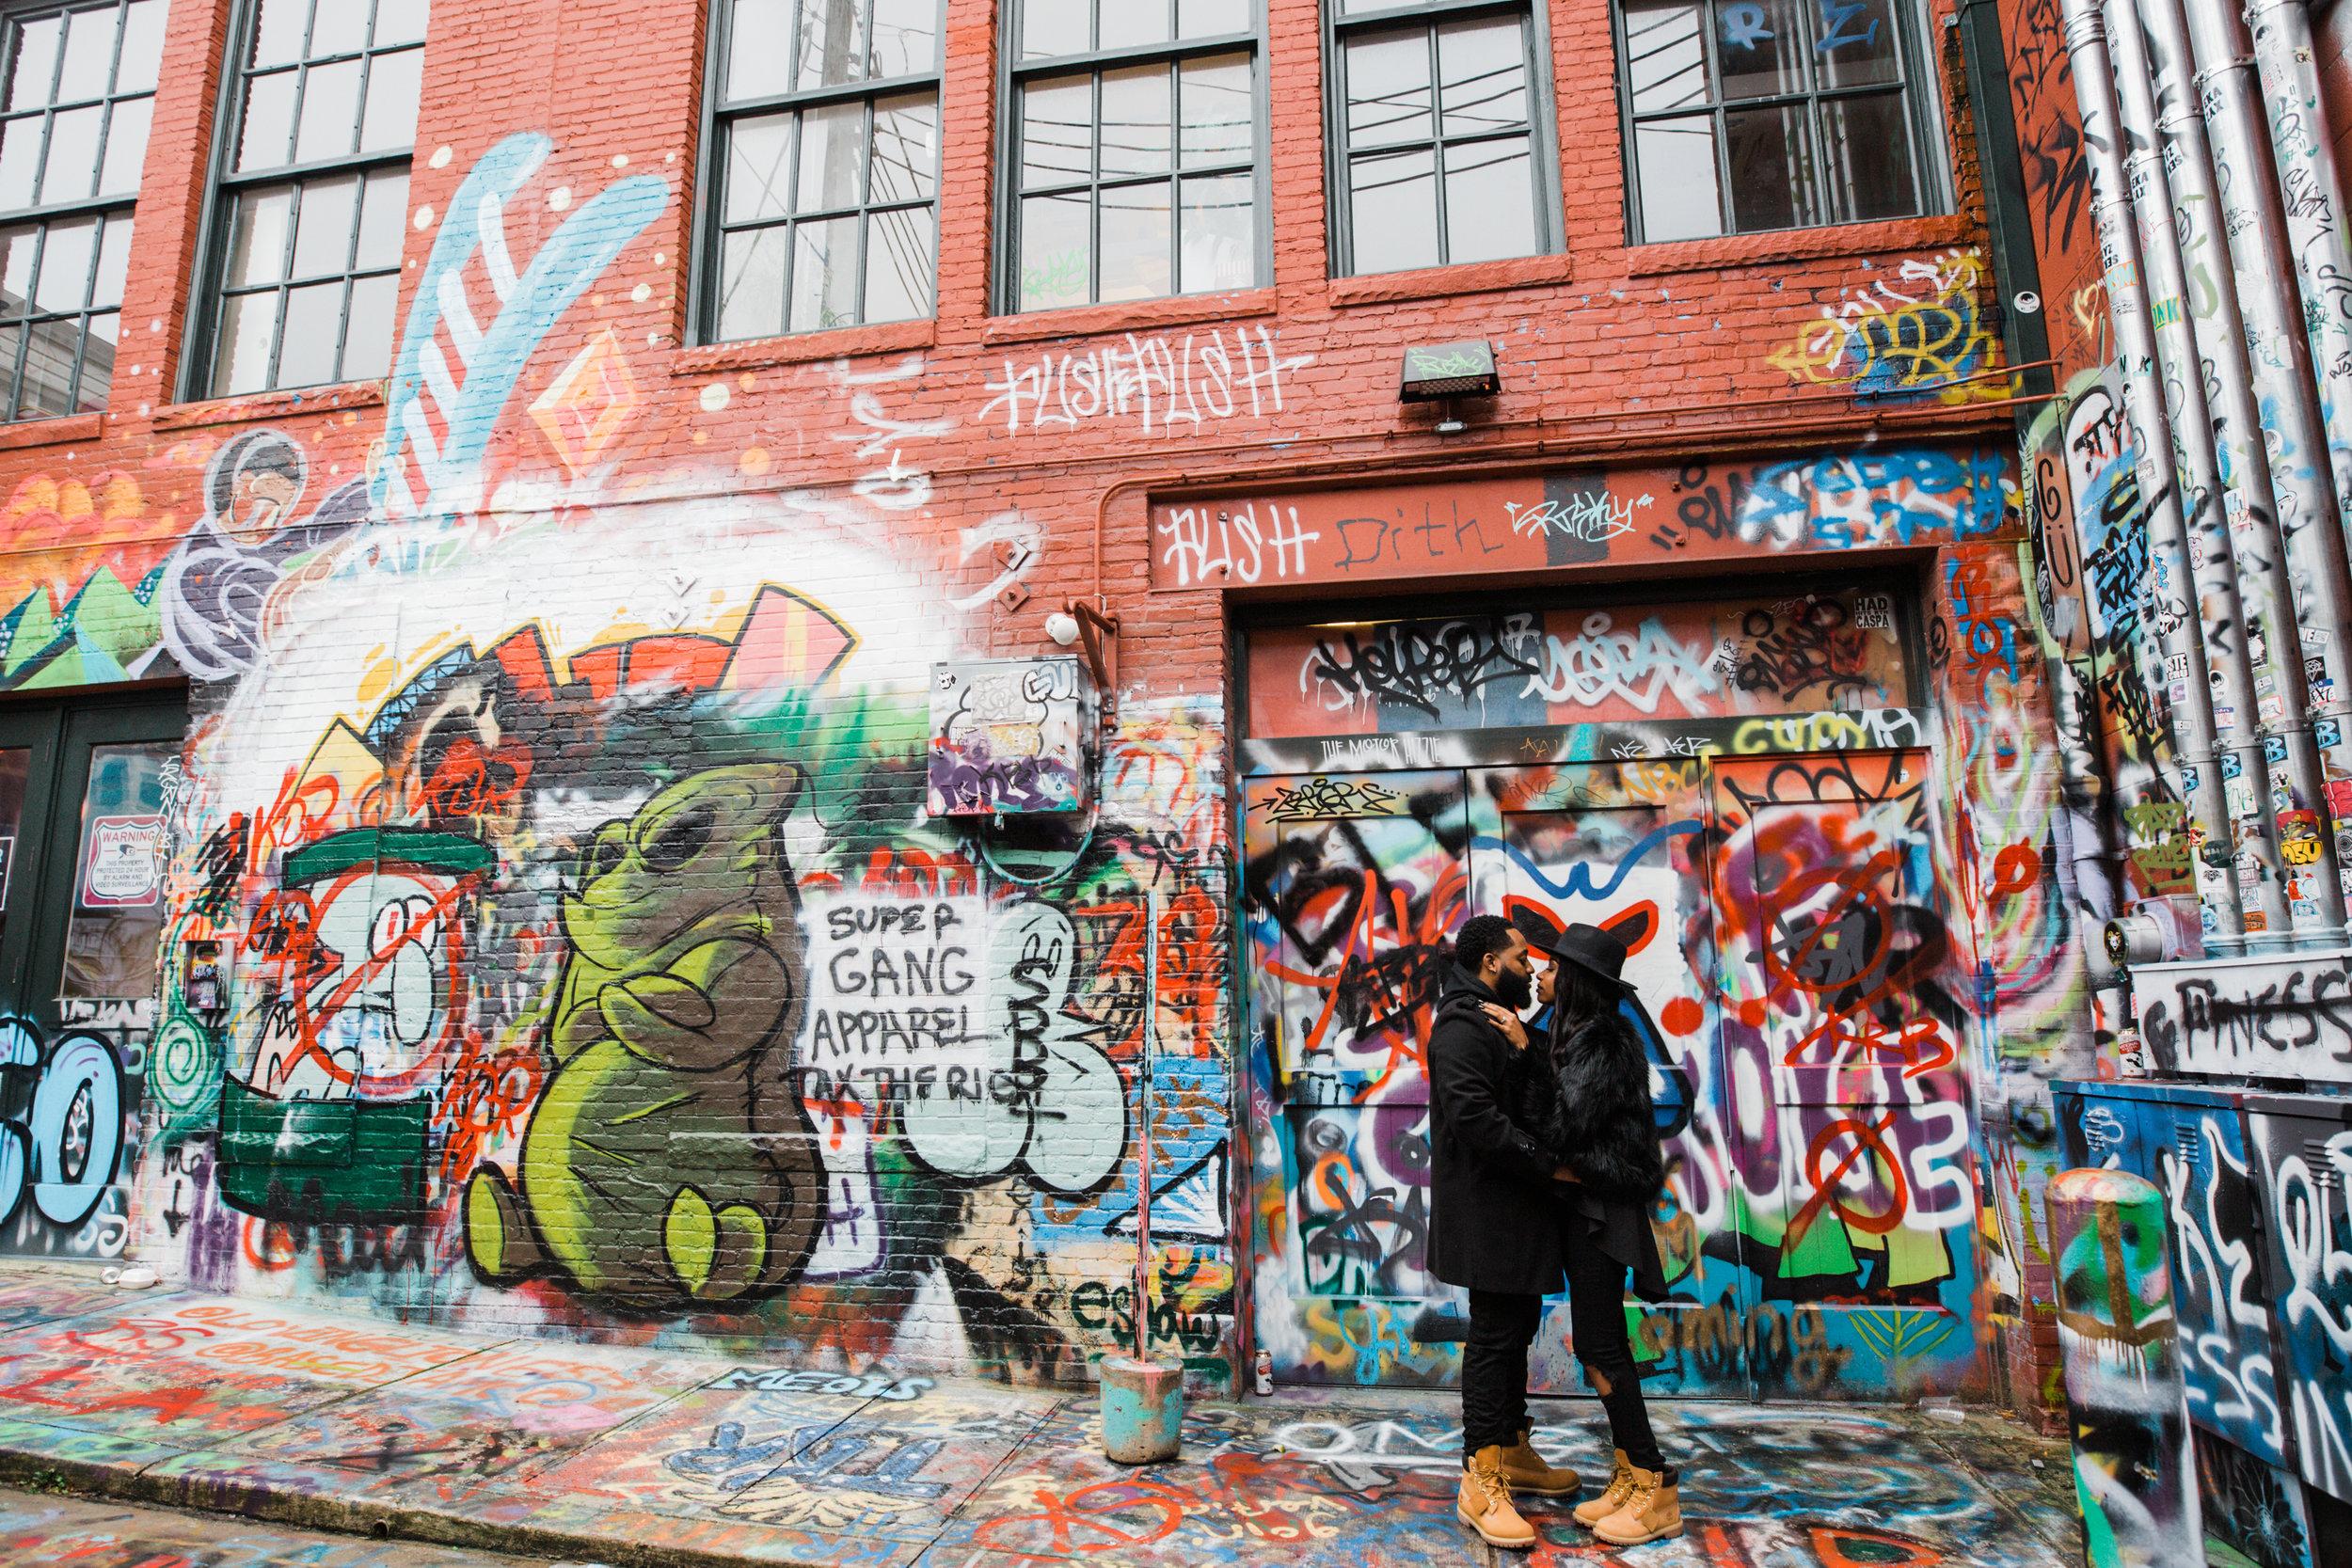 Creative Baltimore Graffiti Alley Engagement Session Megapixels Media Photography-10.jpg